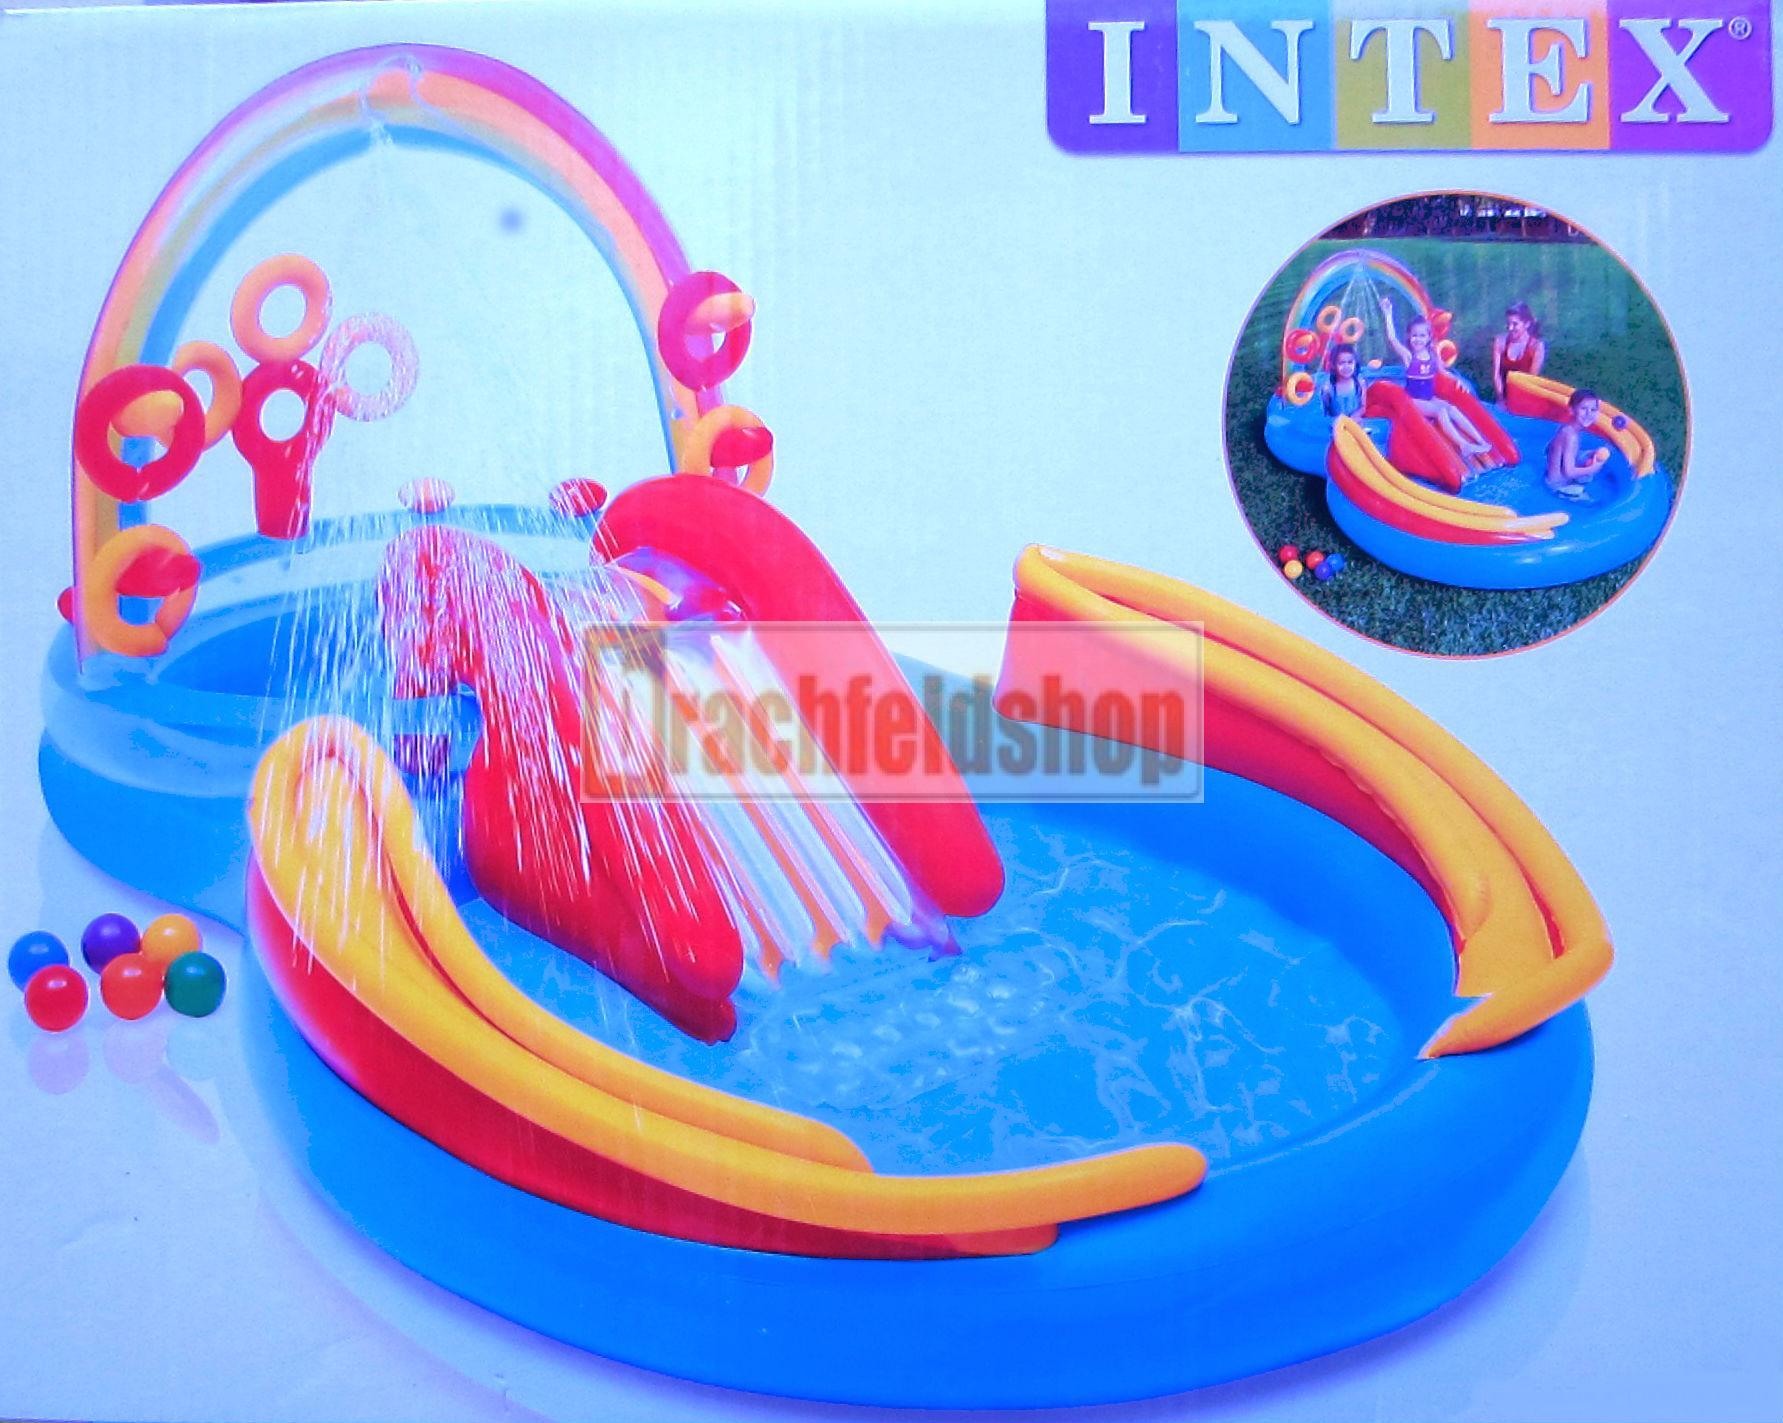 intex rainbow ring playcenter kinder pool rutsche b lle planschbecken ebay. Black Bedroom Furniture Sets. Home Design Ideas